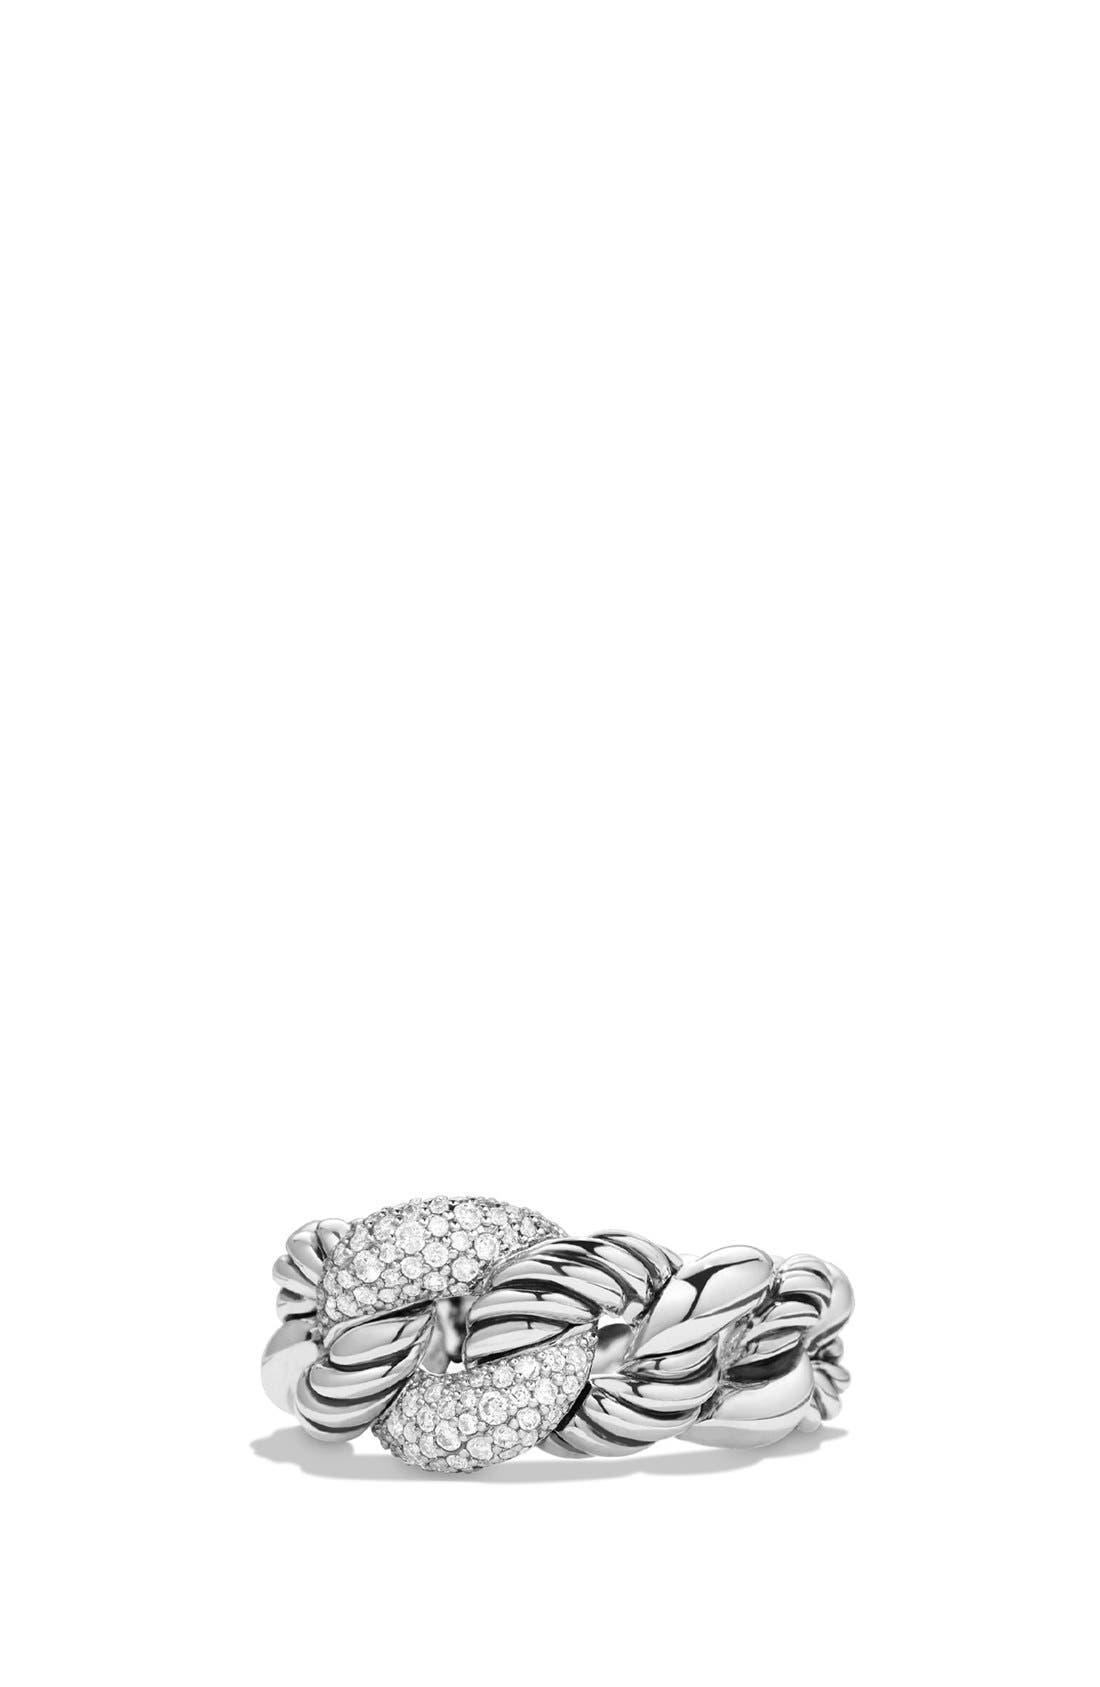 Main Image - David Yurman'Belmont' Curb Link Ring with Diamonds